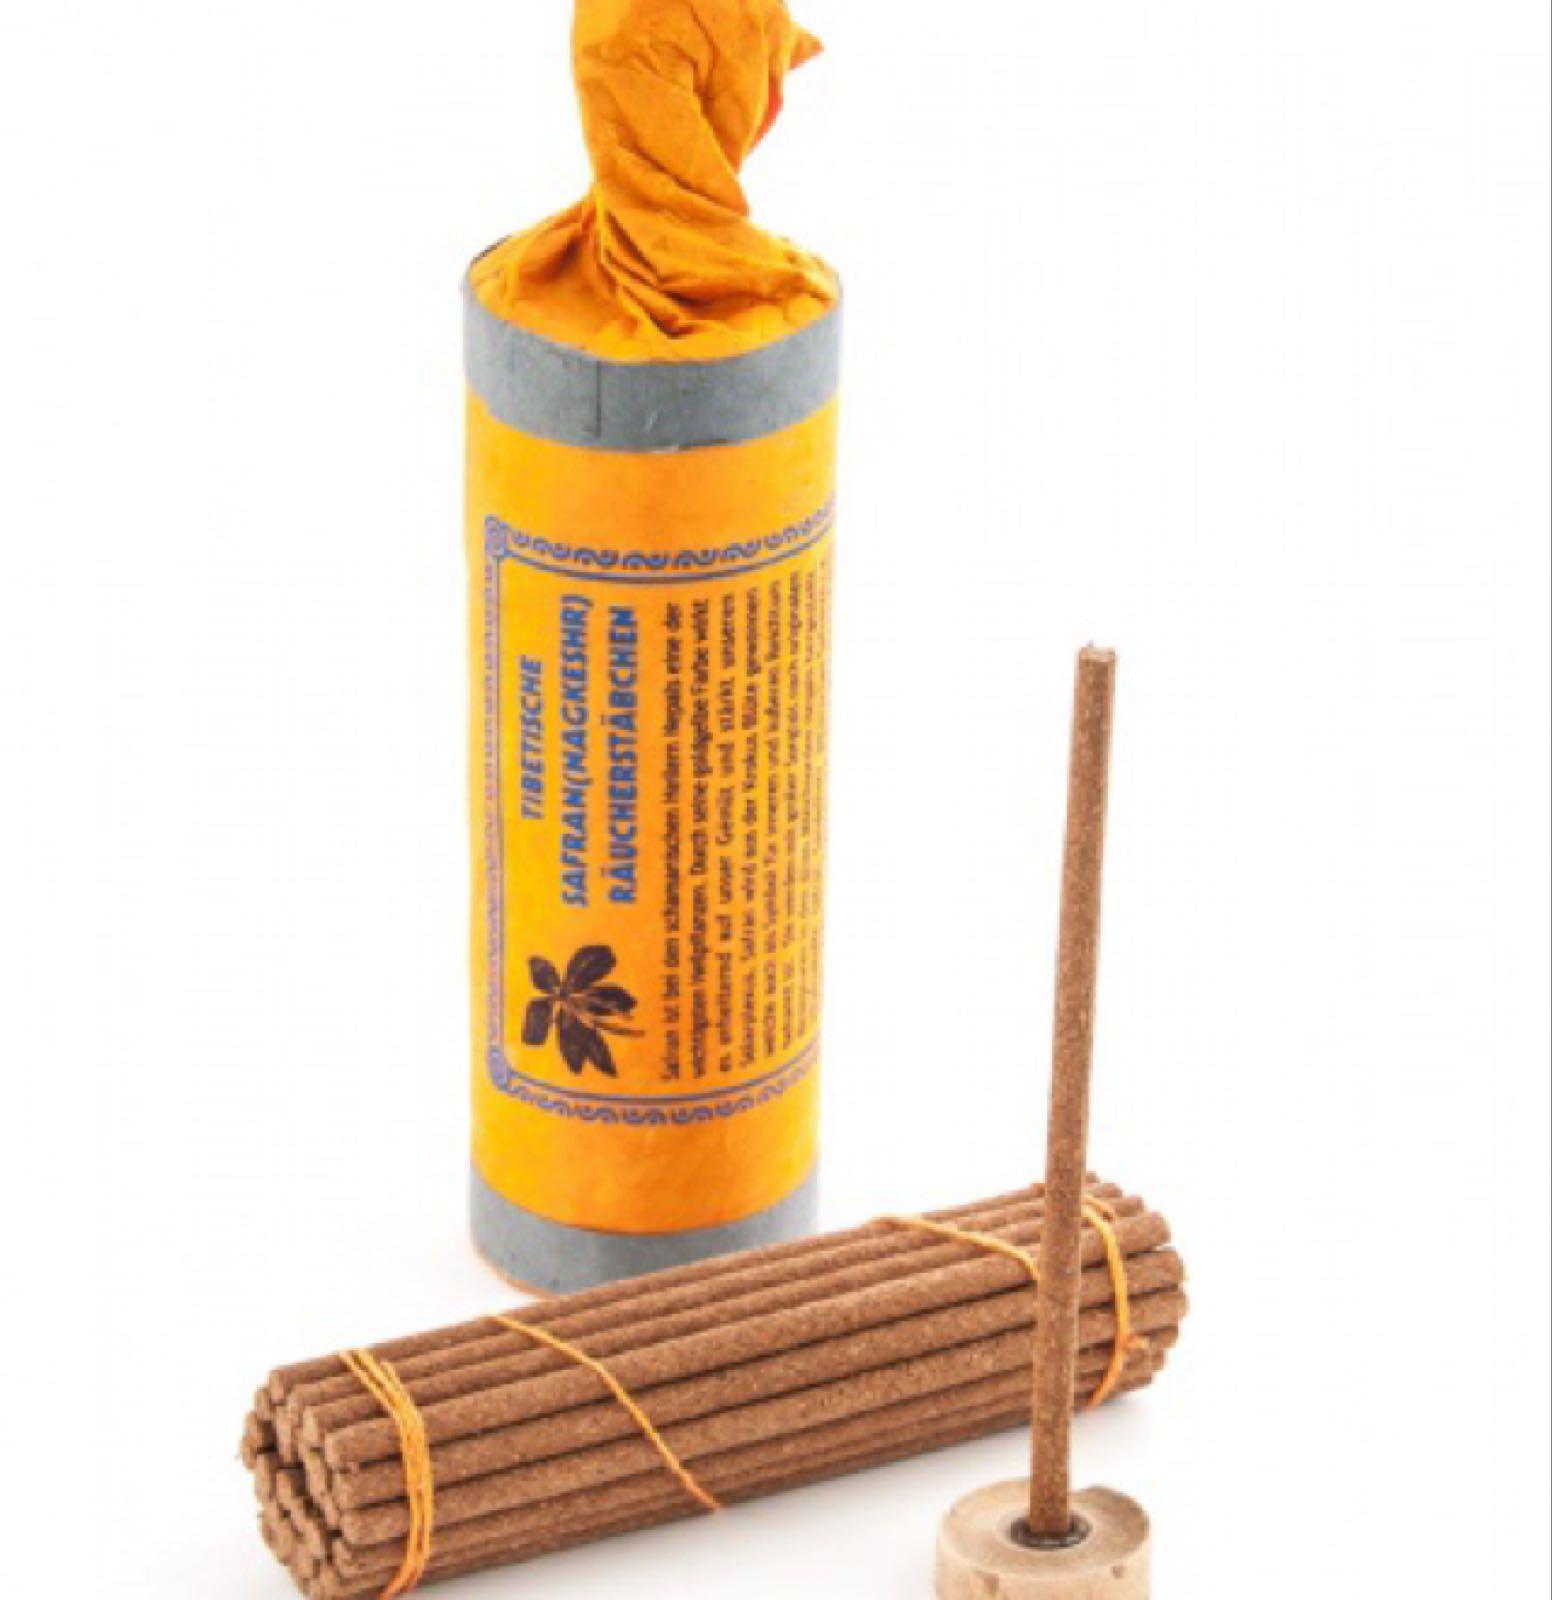 Tibetanska rökelser 79:-